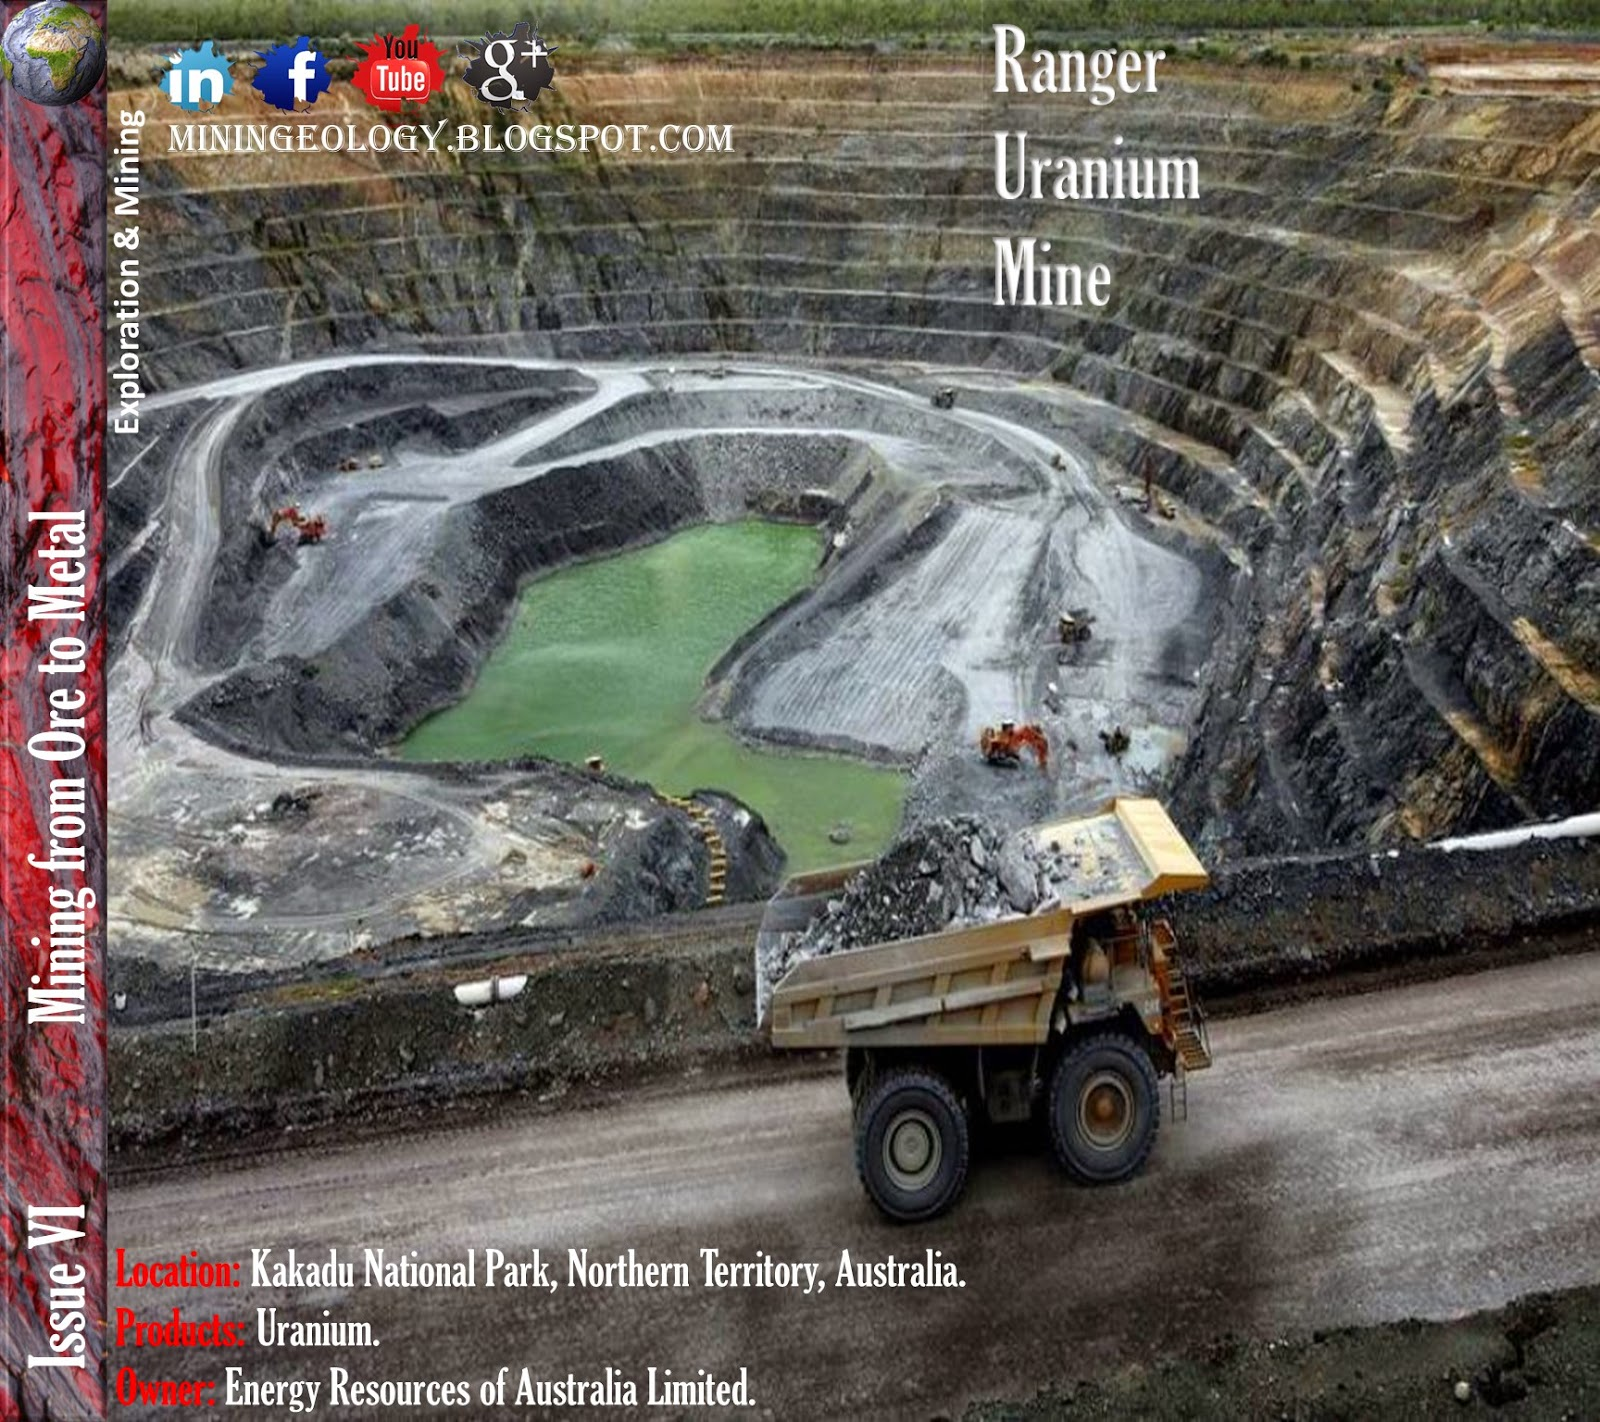 The Ranger Uranium Mine